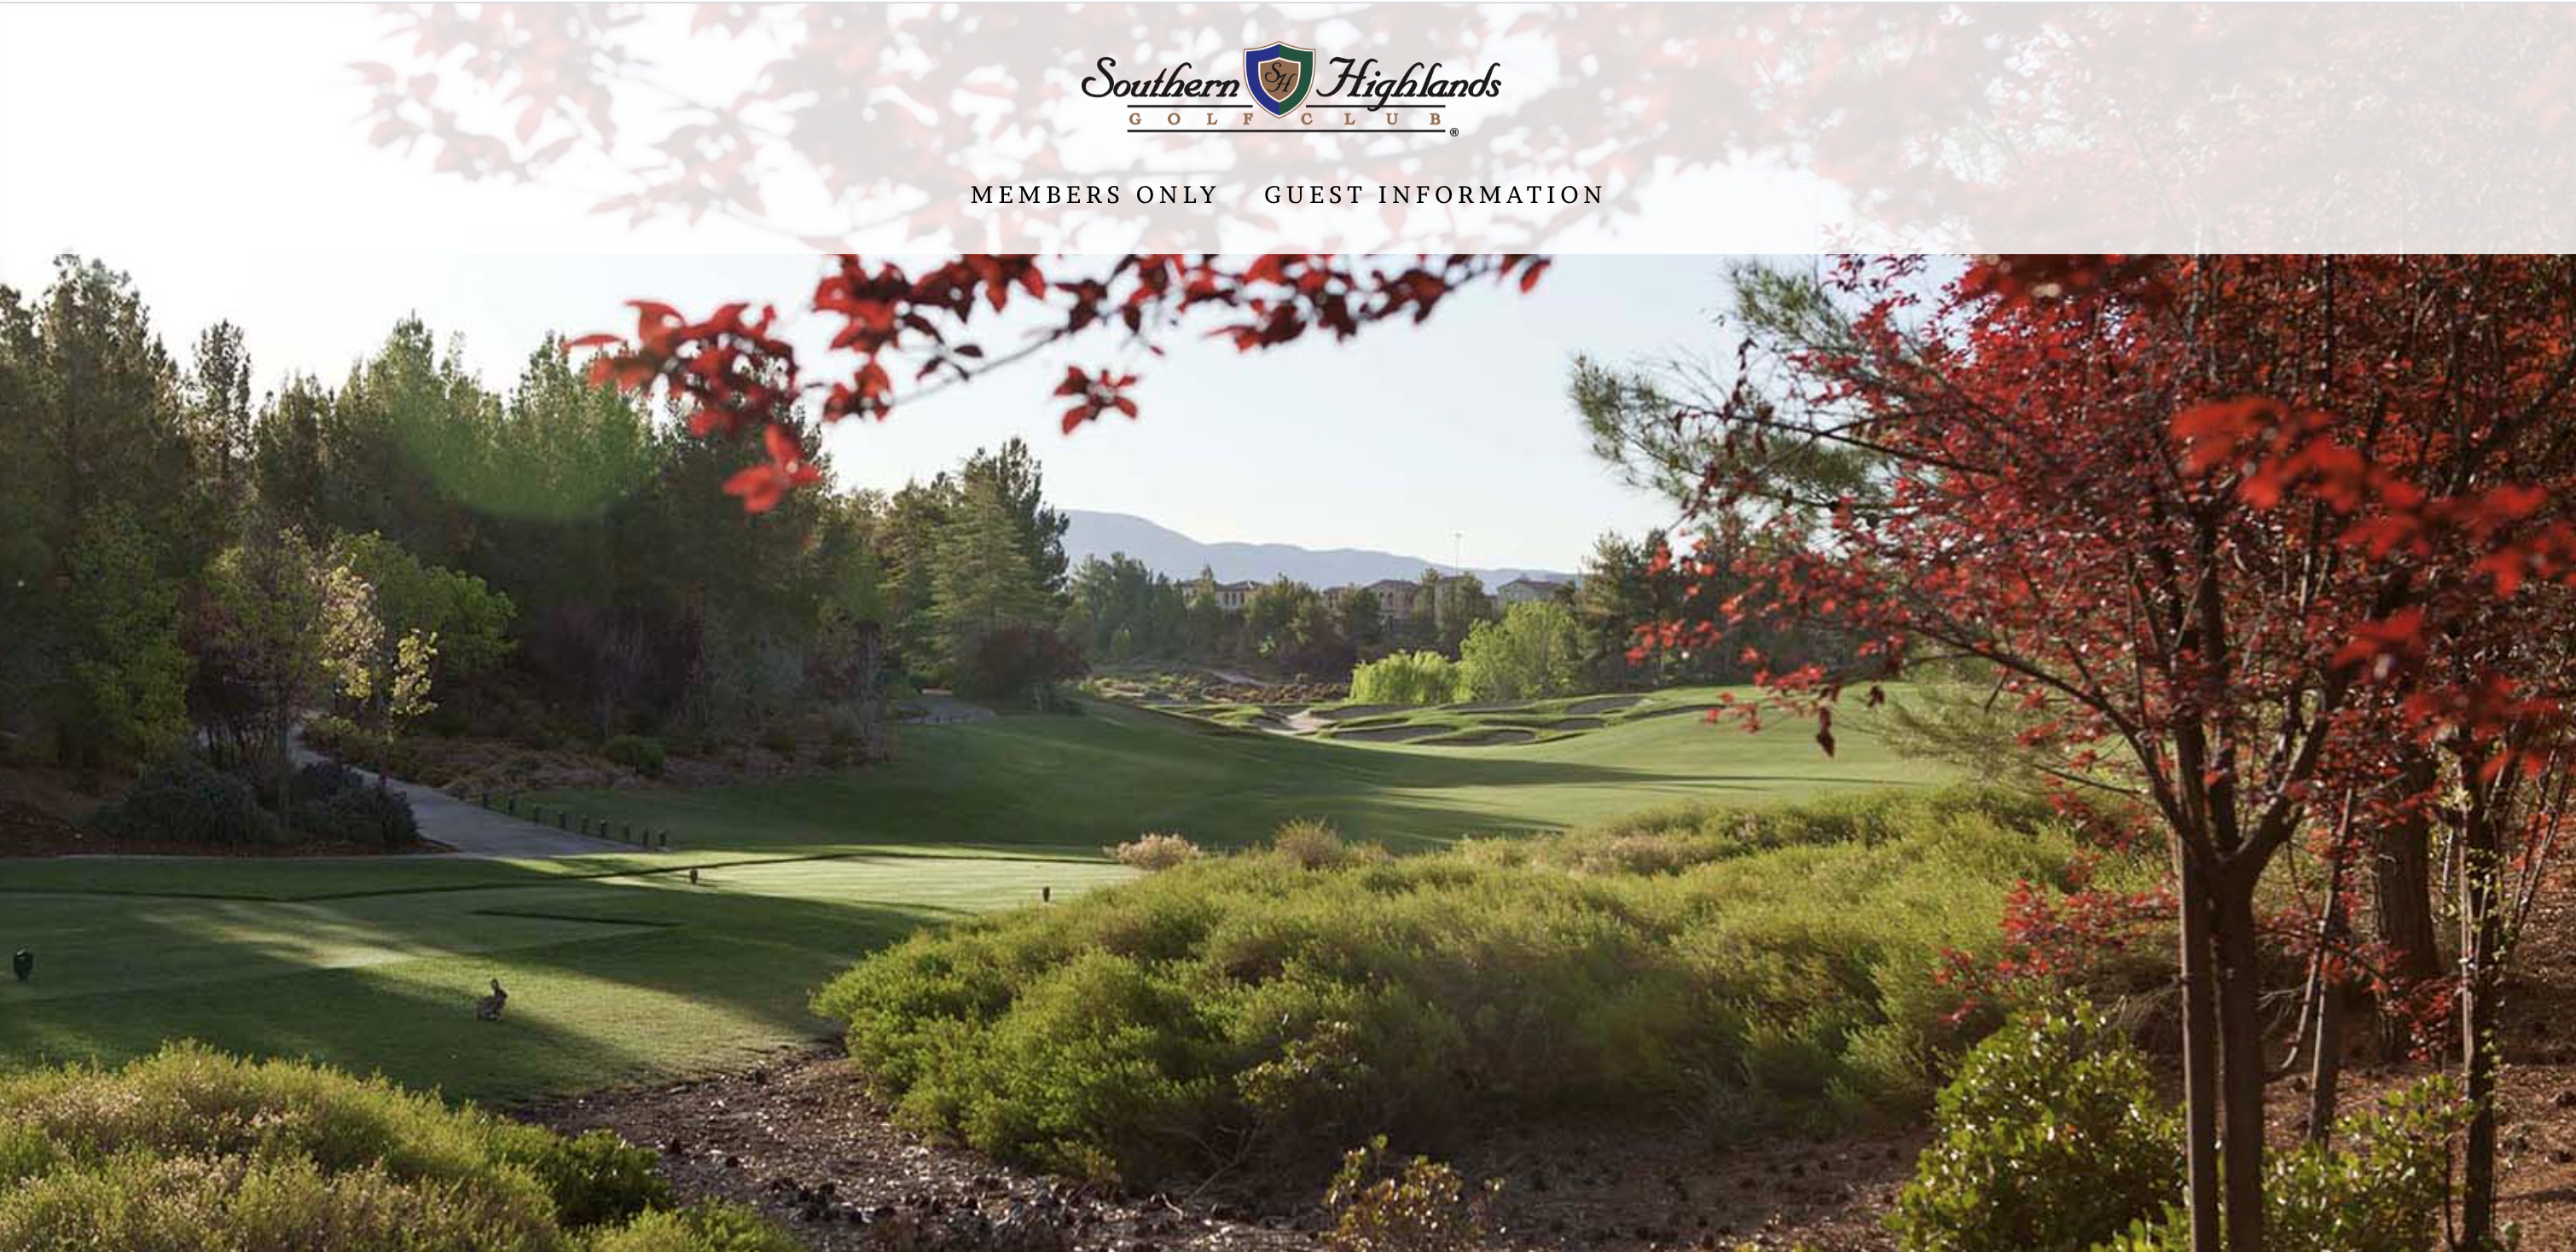 Southern Highlands Golf Club Las Vegas Website Homepage